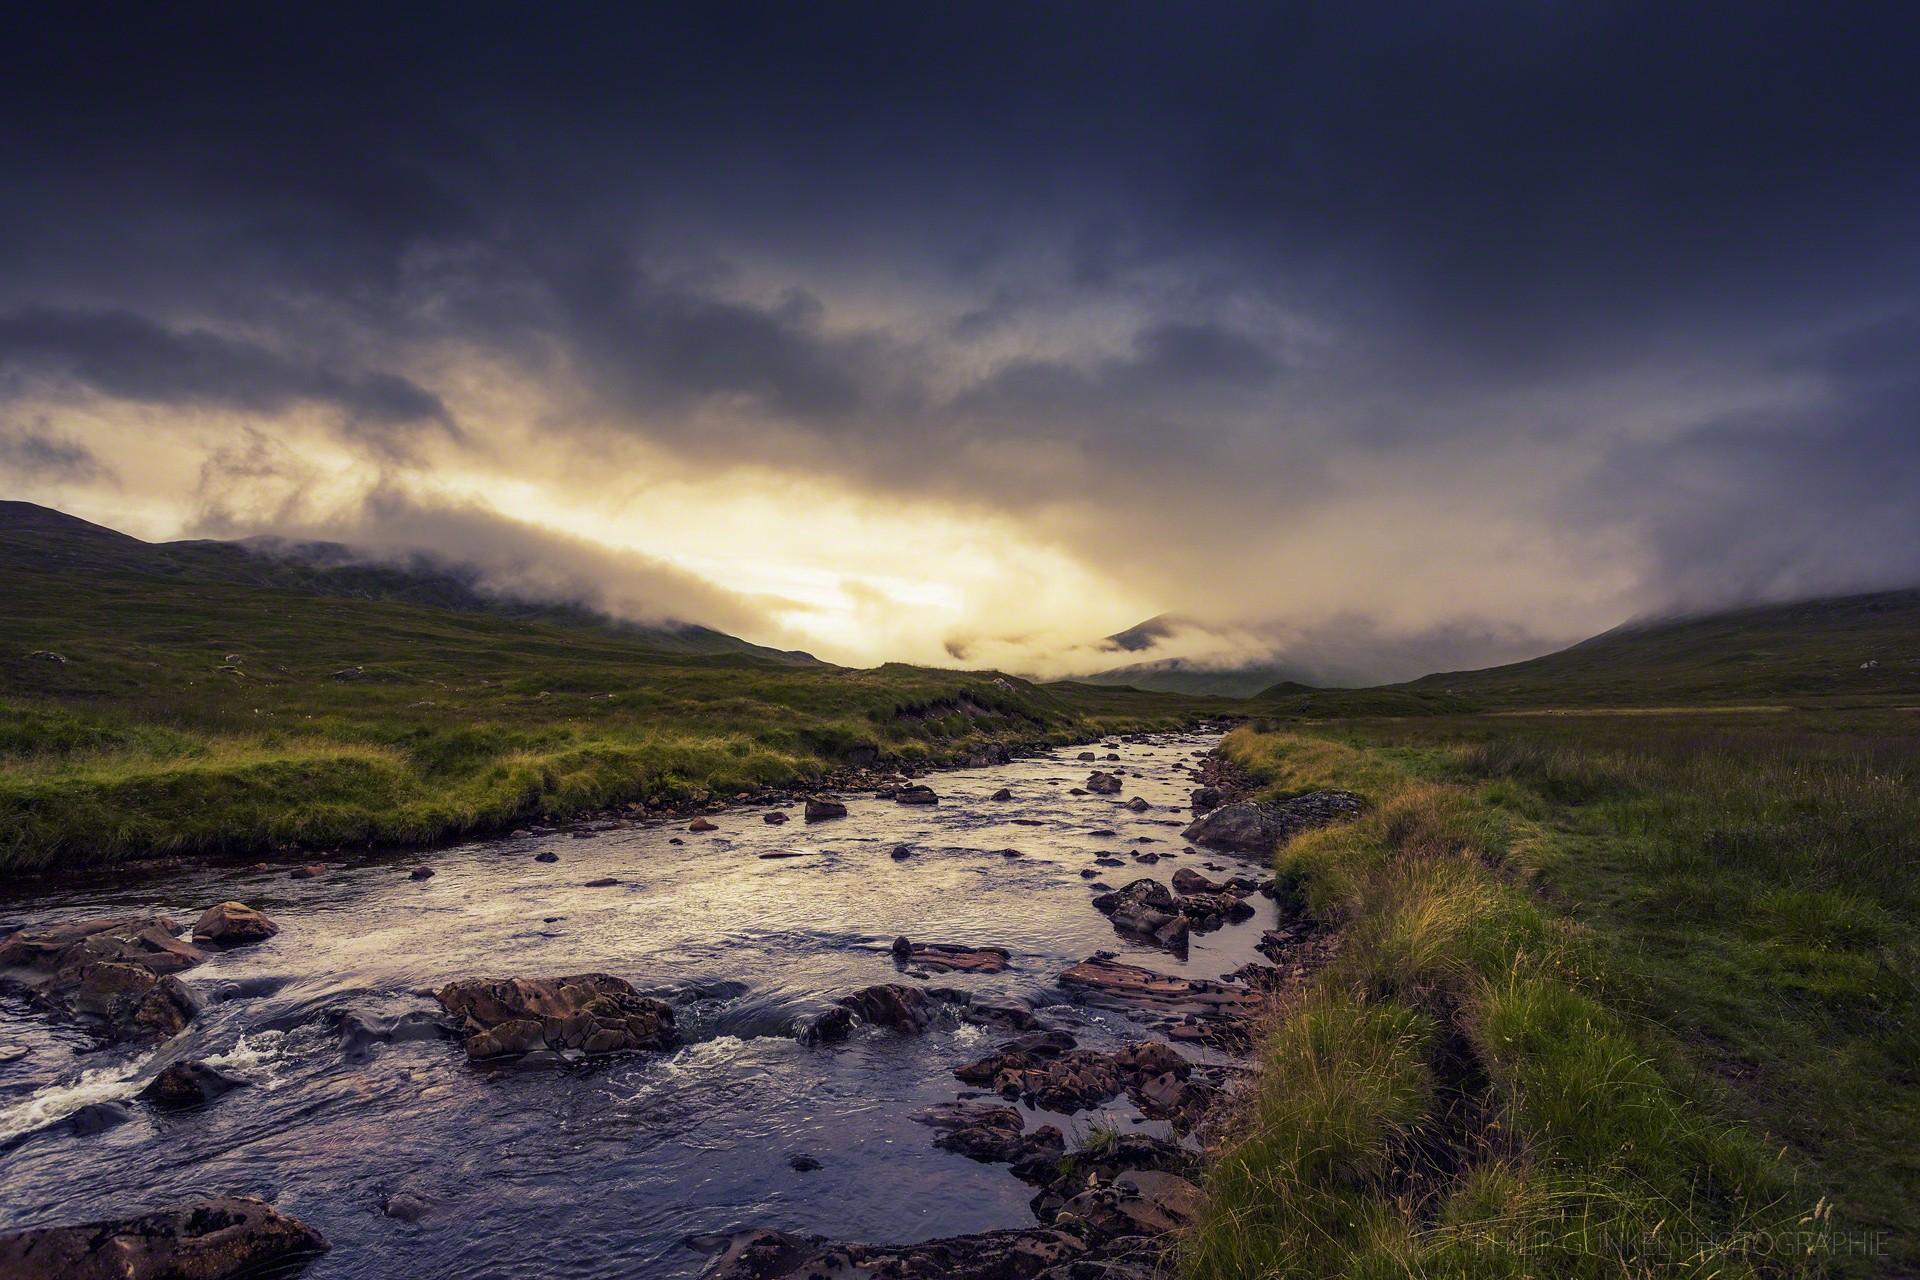 scotland_philip_gunkel_photographie_www.philipgunkel.de29